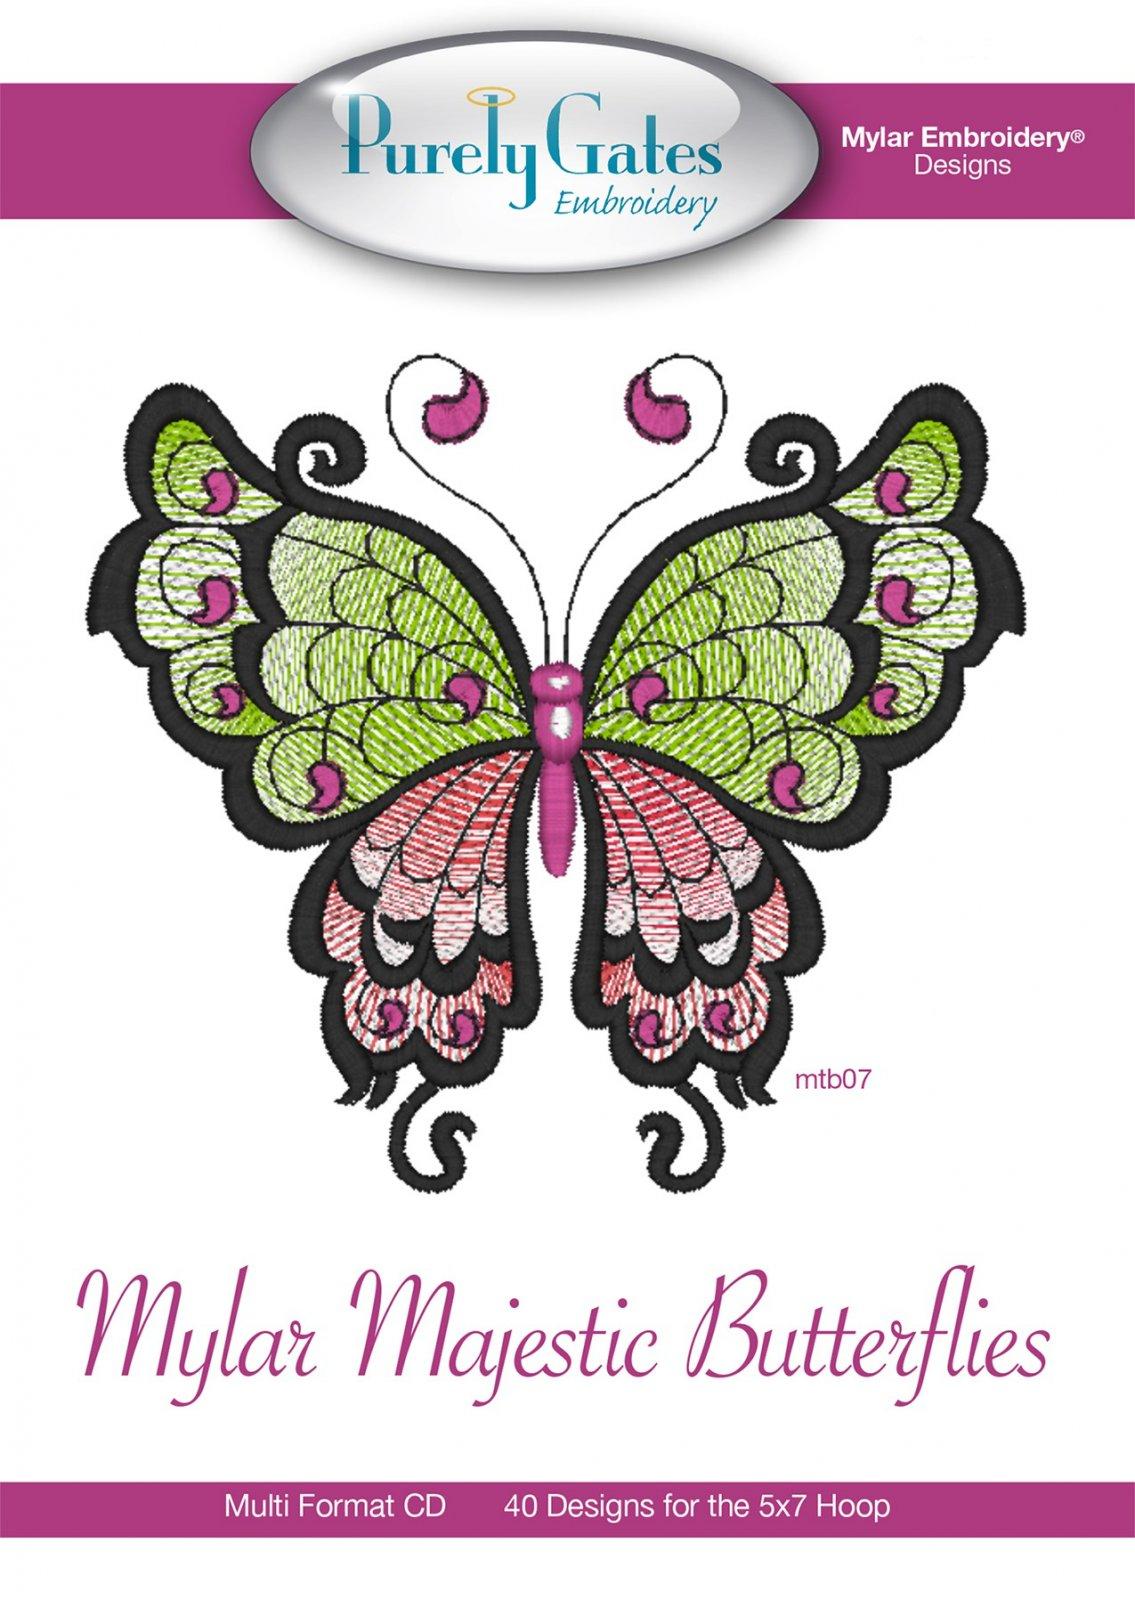 CD Mylar Embroidery Designs Mylar Majestic Butterflies Machine Embroidery